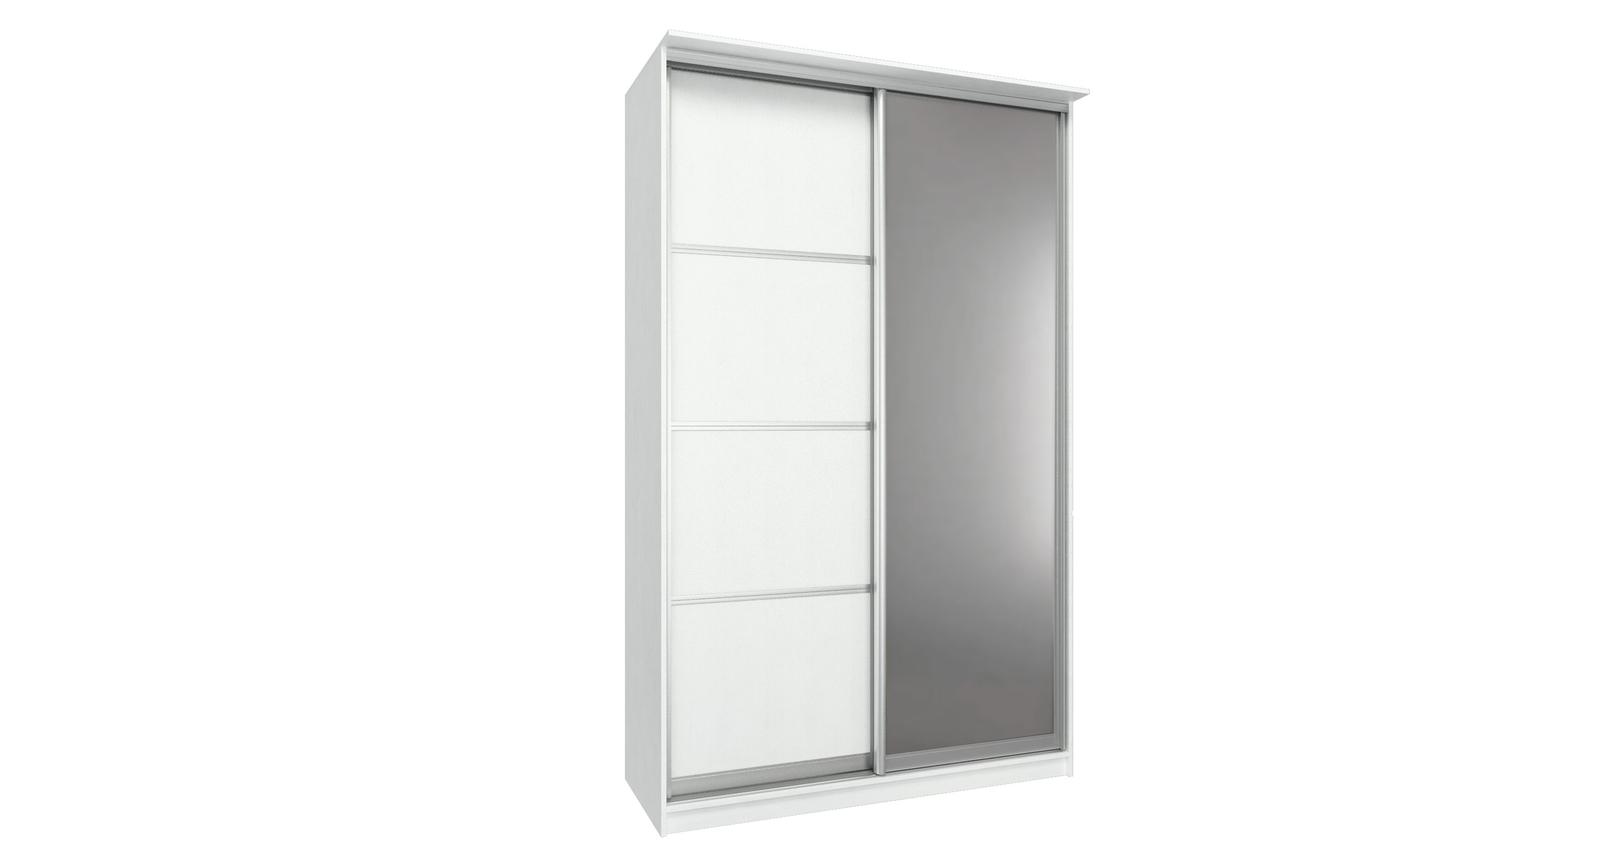 Шкаф-купе двухдверный Манчестер 150 см (белый+зеркало)